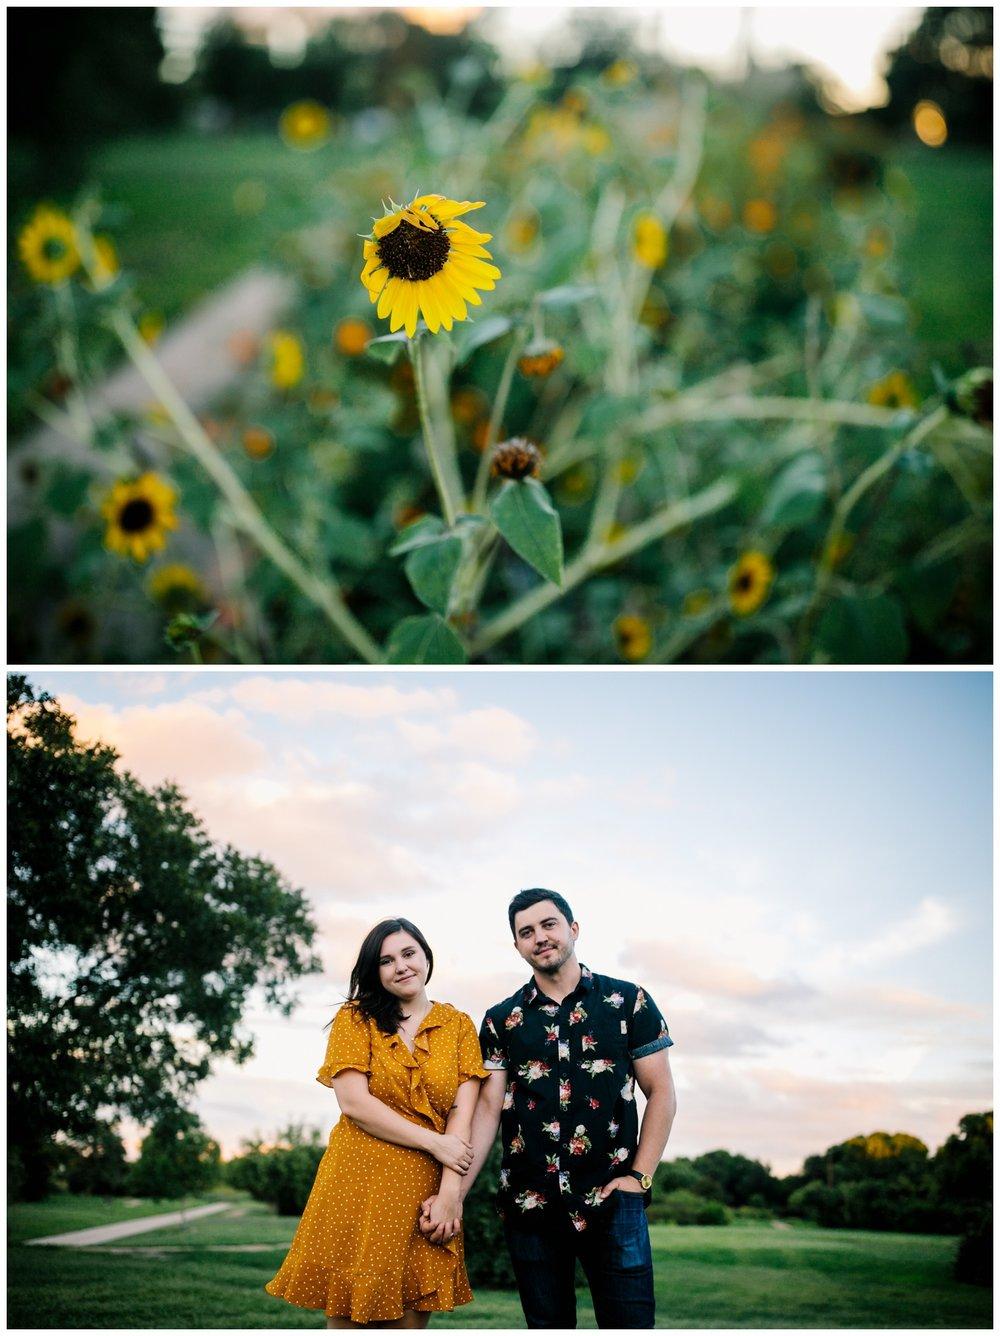 texas proposal engagement photoshoot_054.jpg